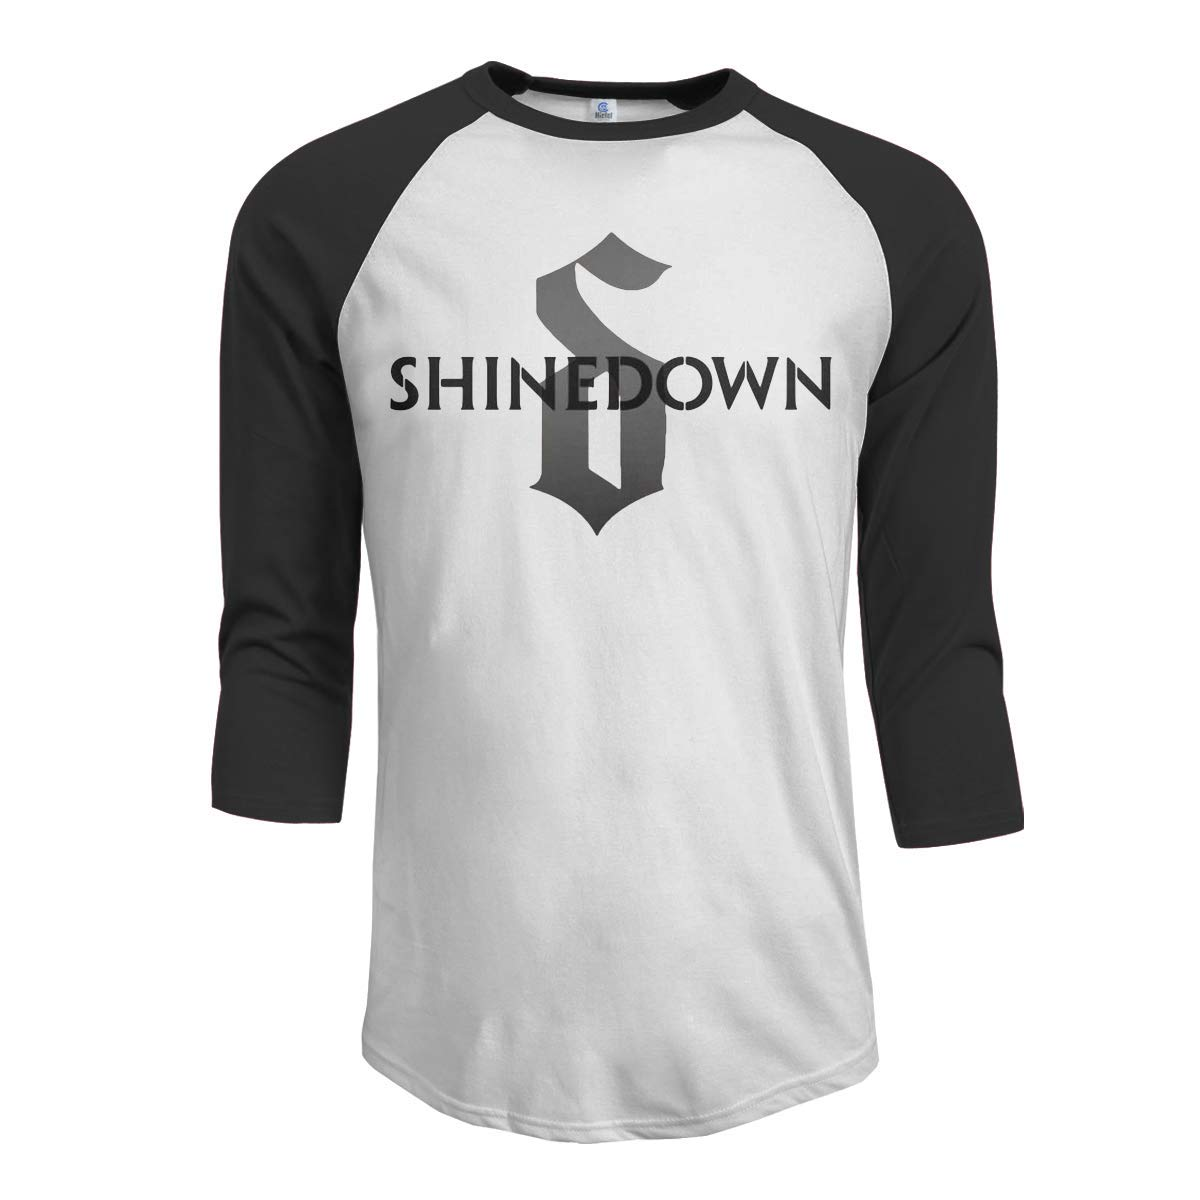 Macwe Shinedown S 3 4 Sleeve Baseball Black Shirts